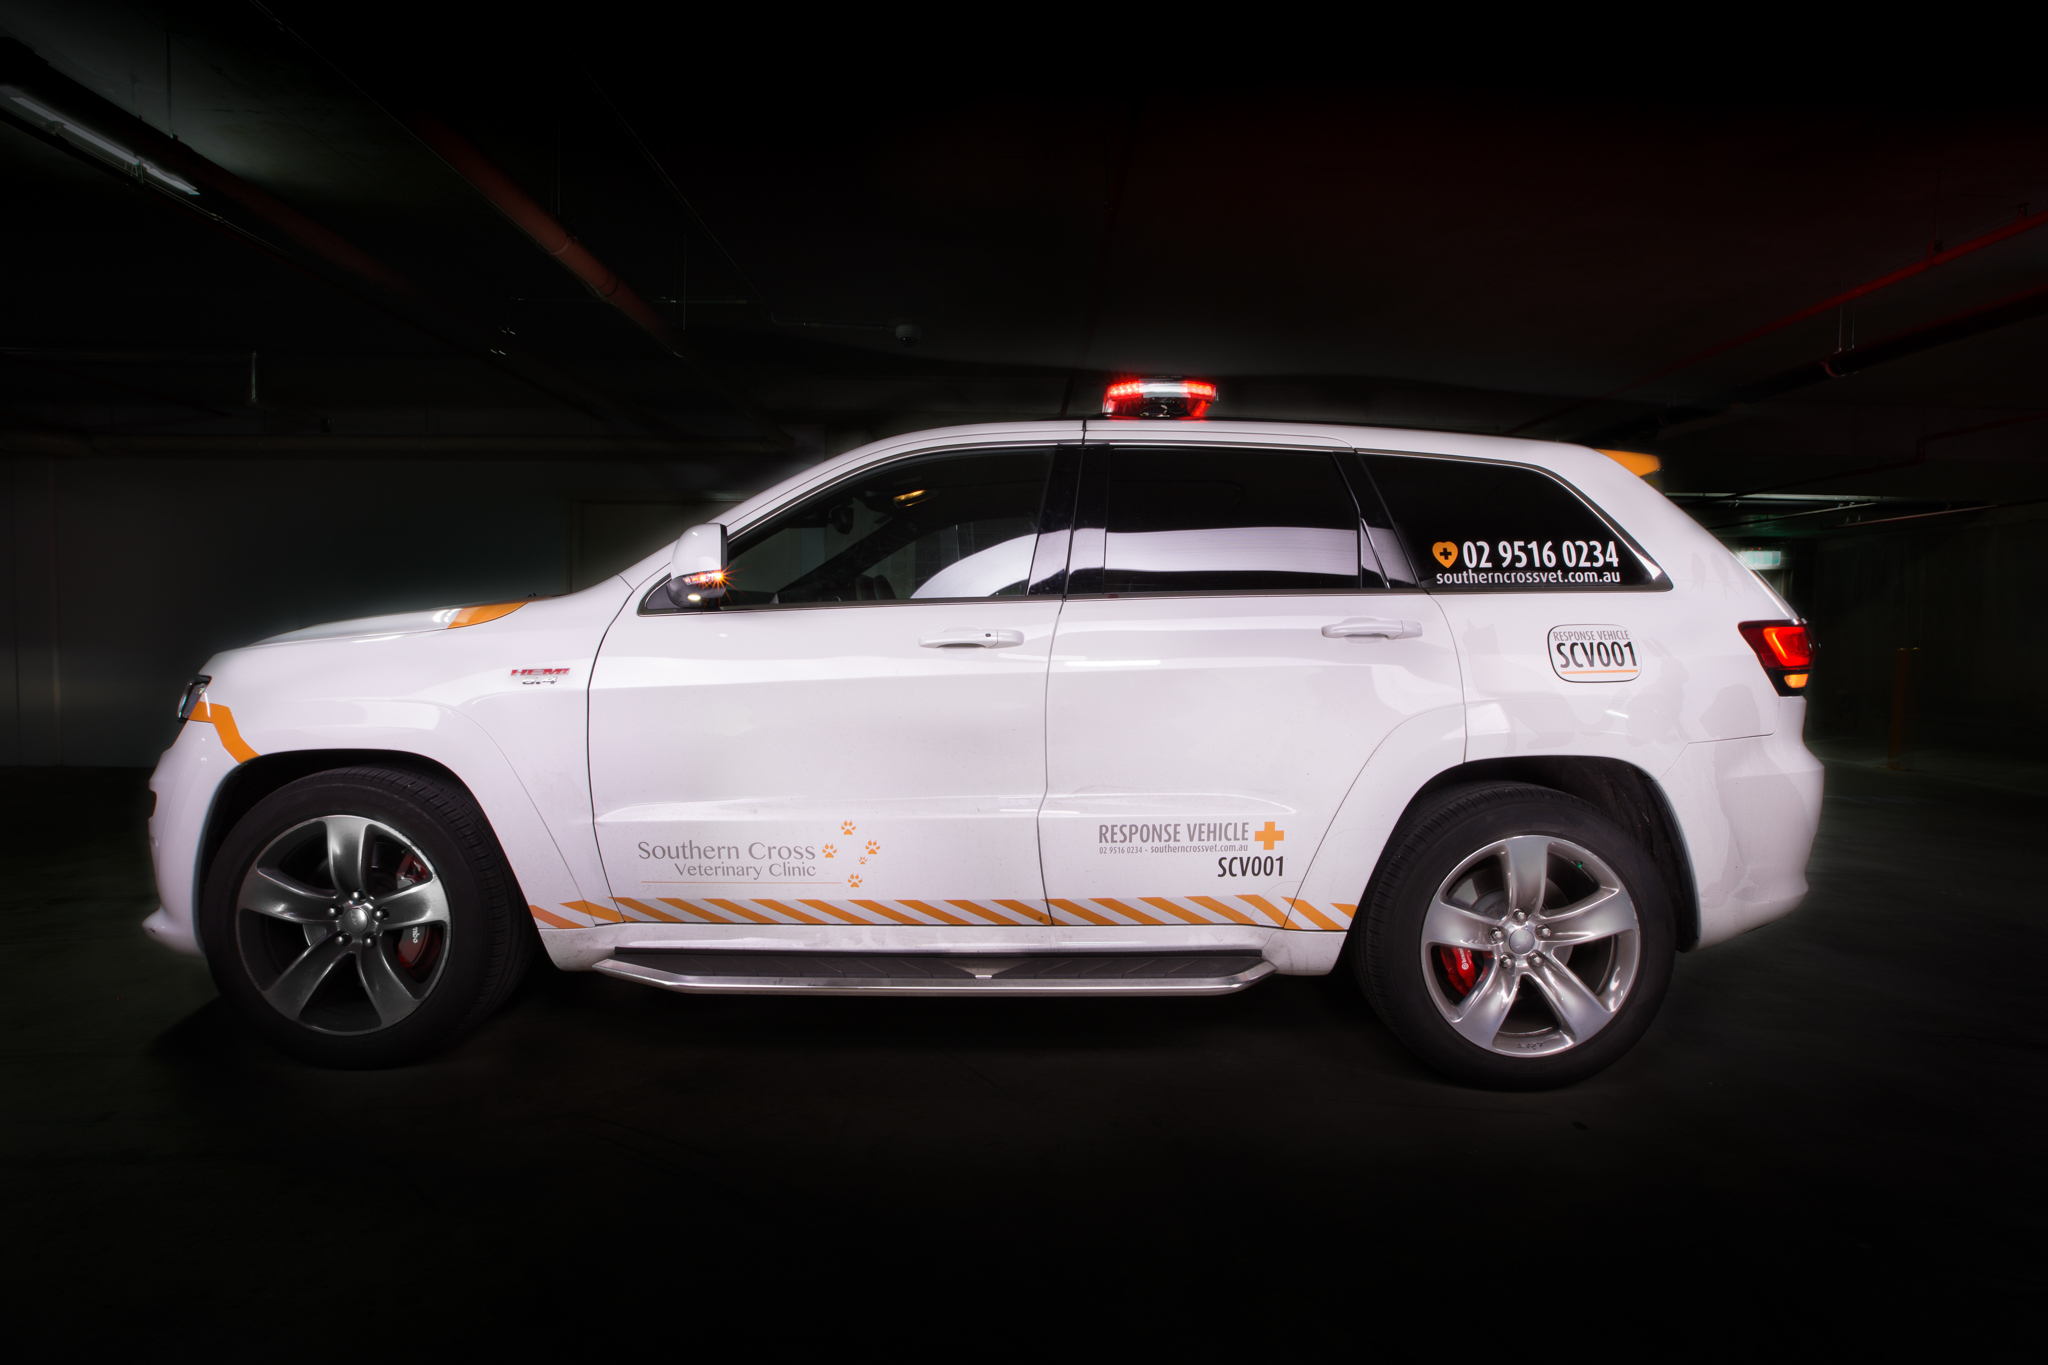 Southern Cross Vet Response Vehicle, Jeep Grand Cherokee Car Photography